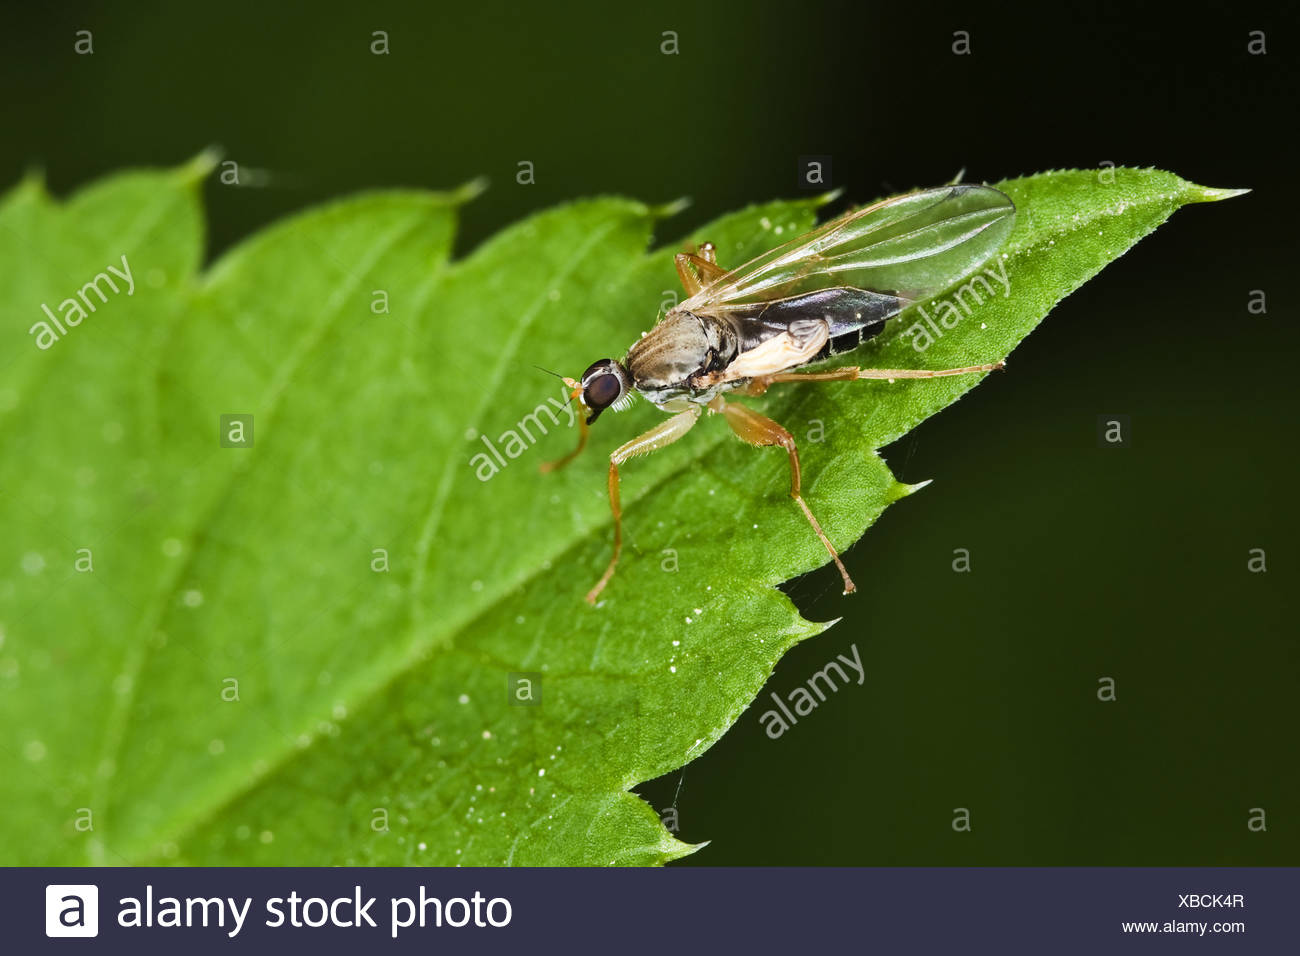 Fly (order Diptera, suborder Brachycera) Stock Photo